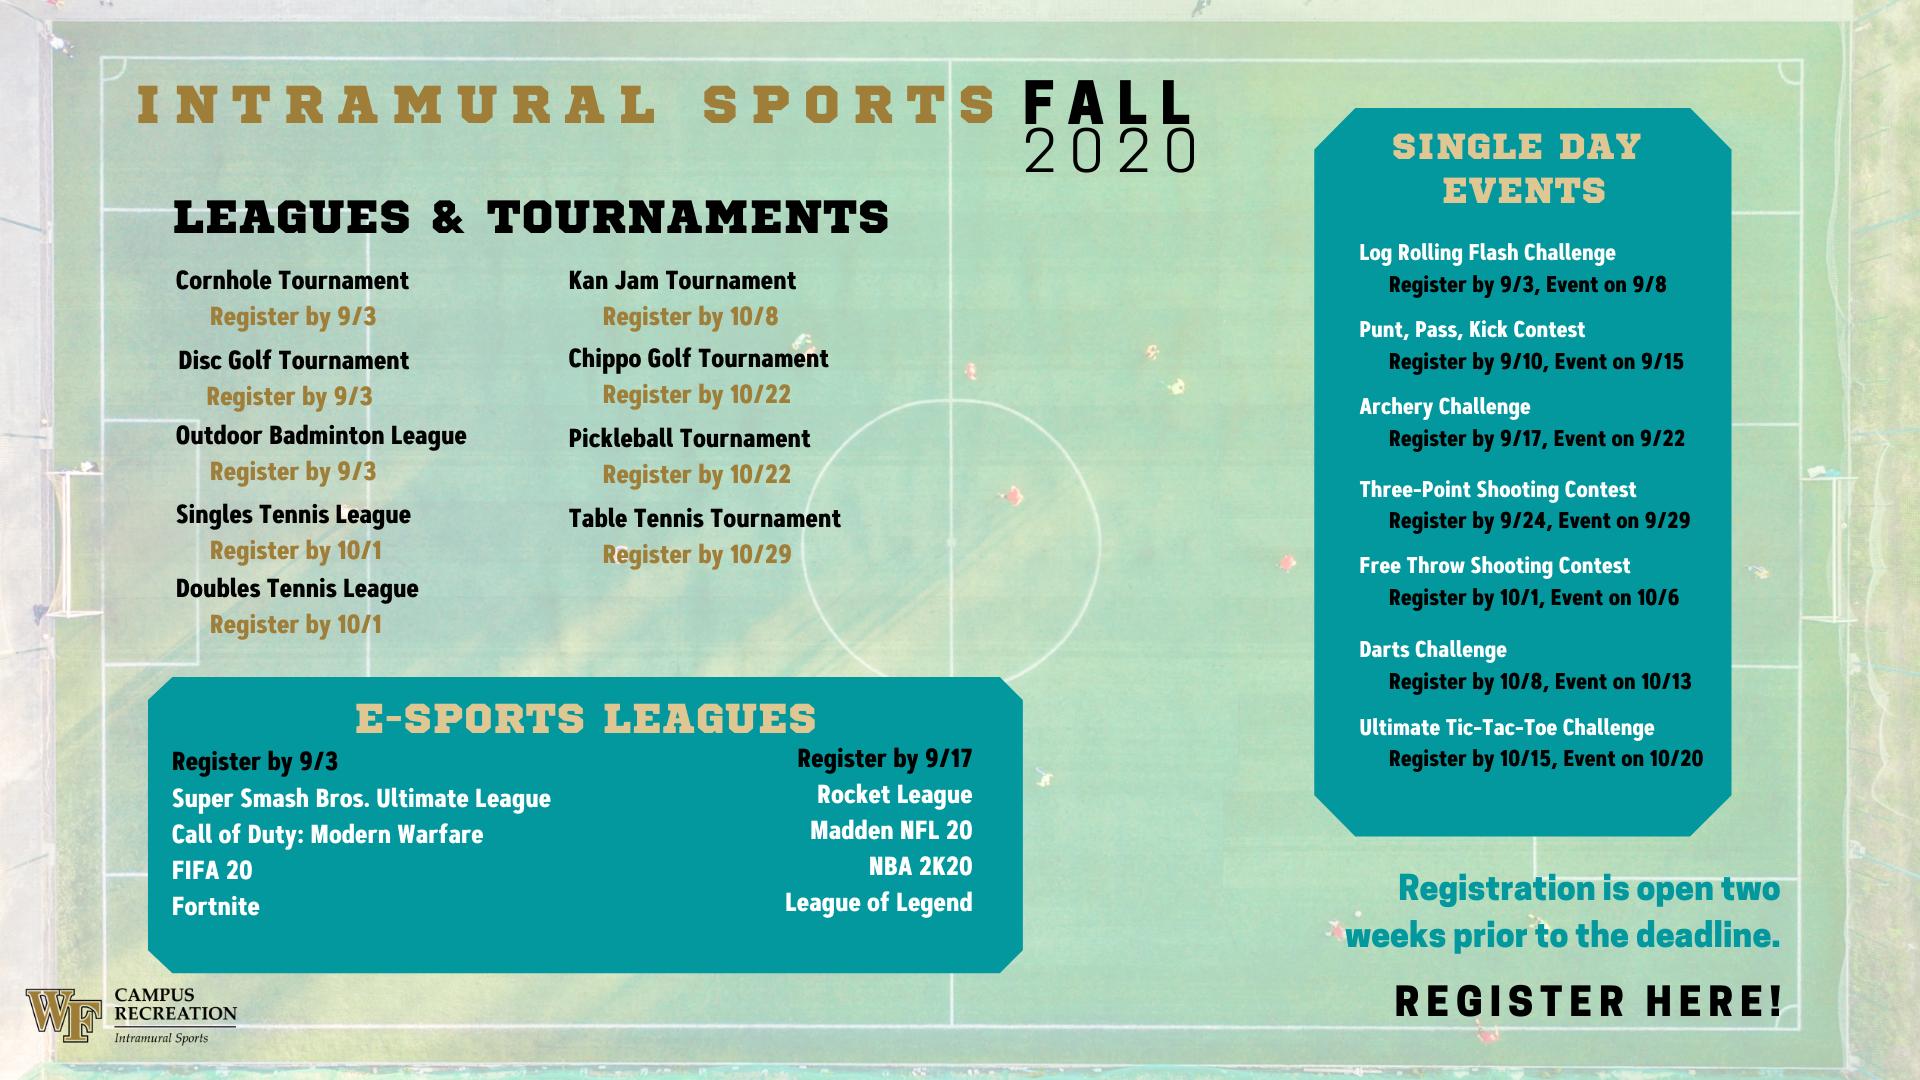 Intramural Sports Campus Recreation